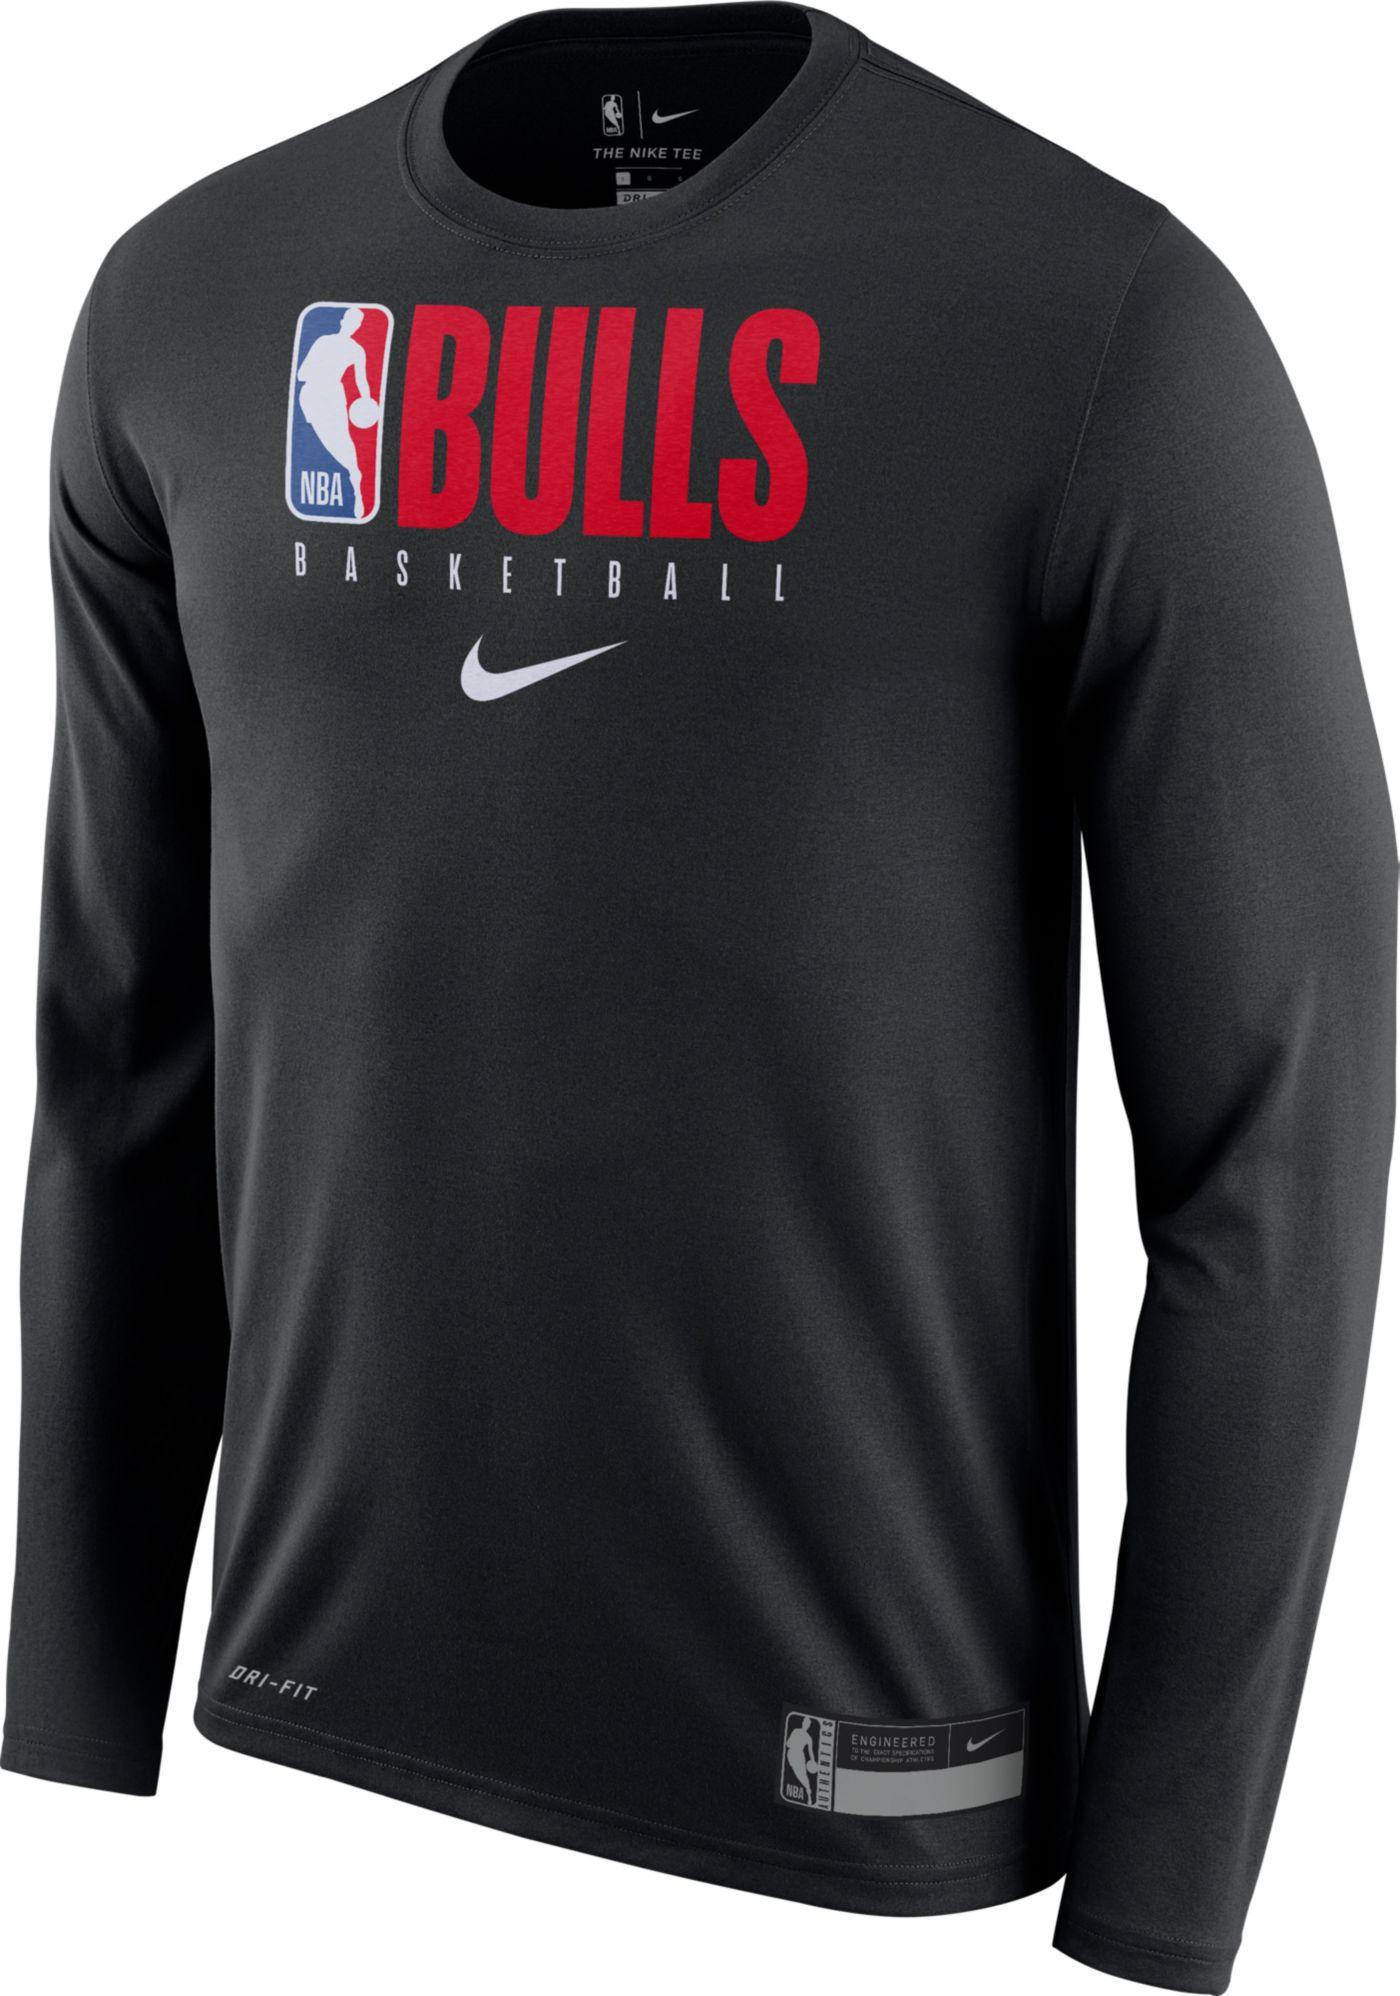 Nike Men's Chicago Bulls Dri-FIT Practice Long Sleeve Shirt